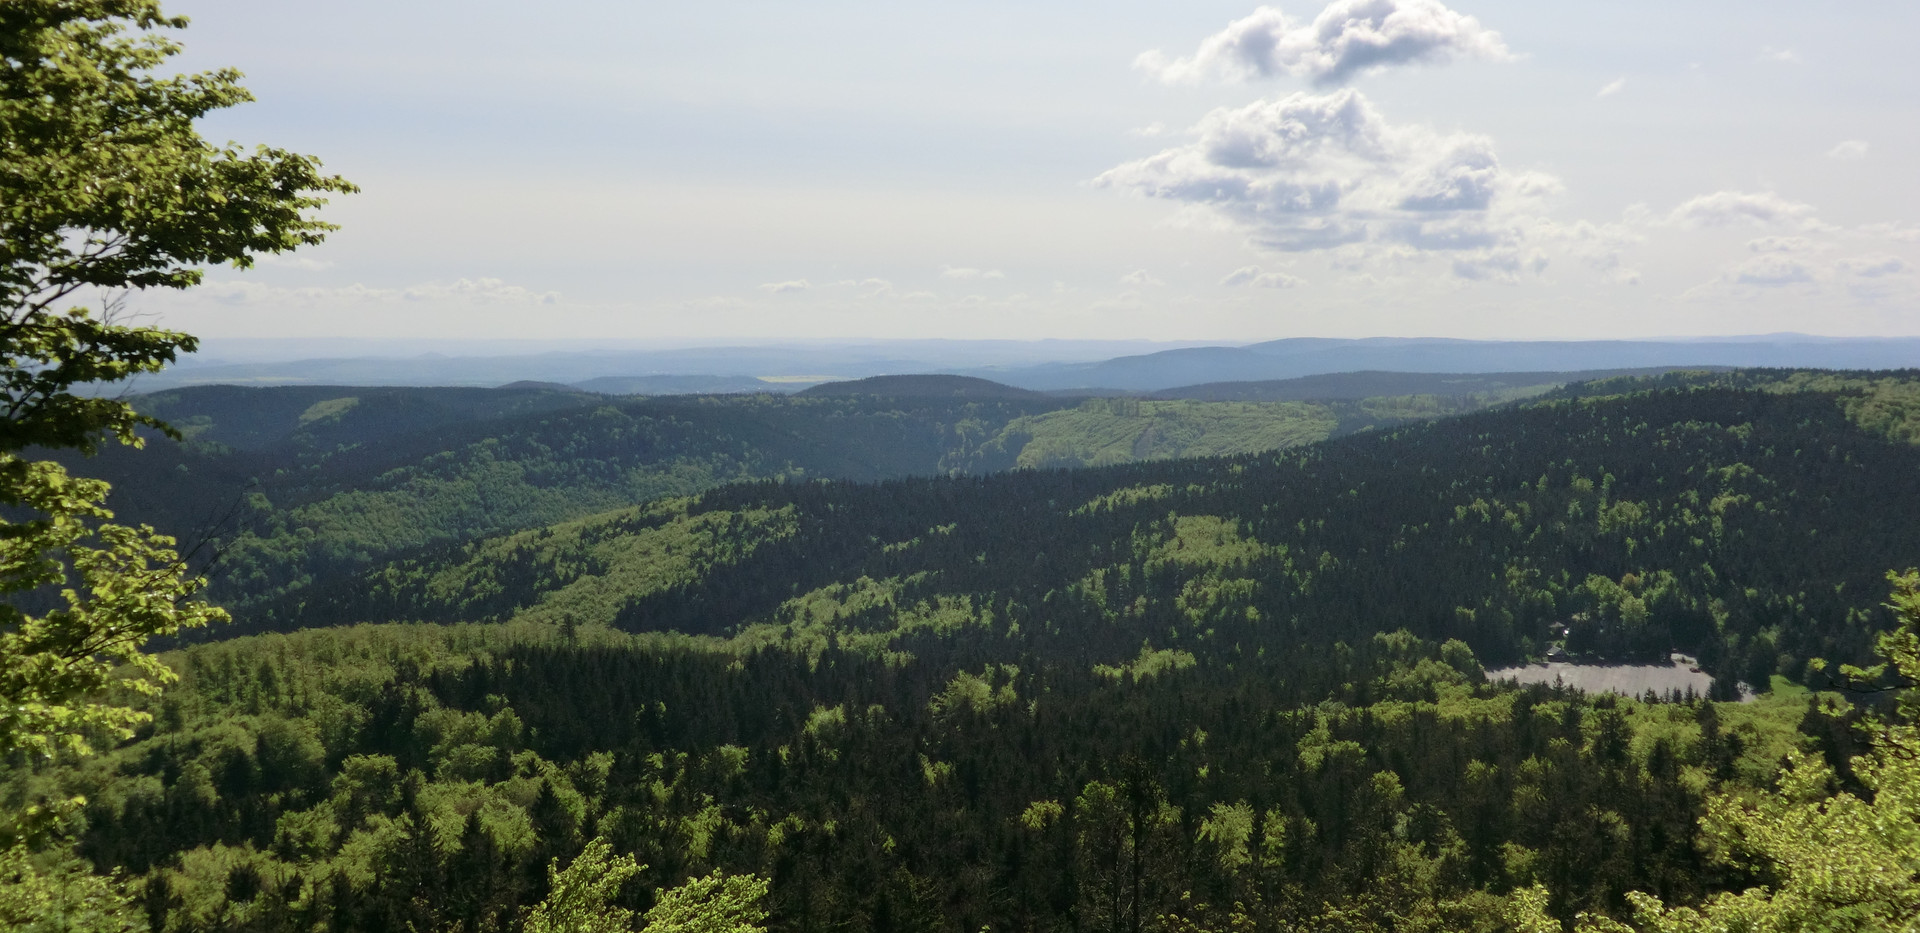 Blick vom Inselsberg